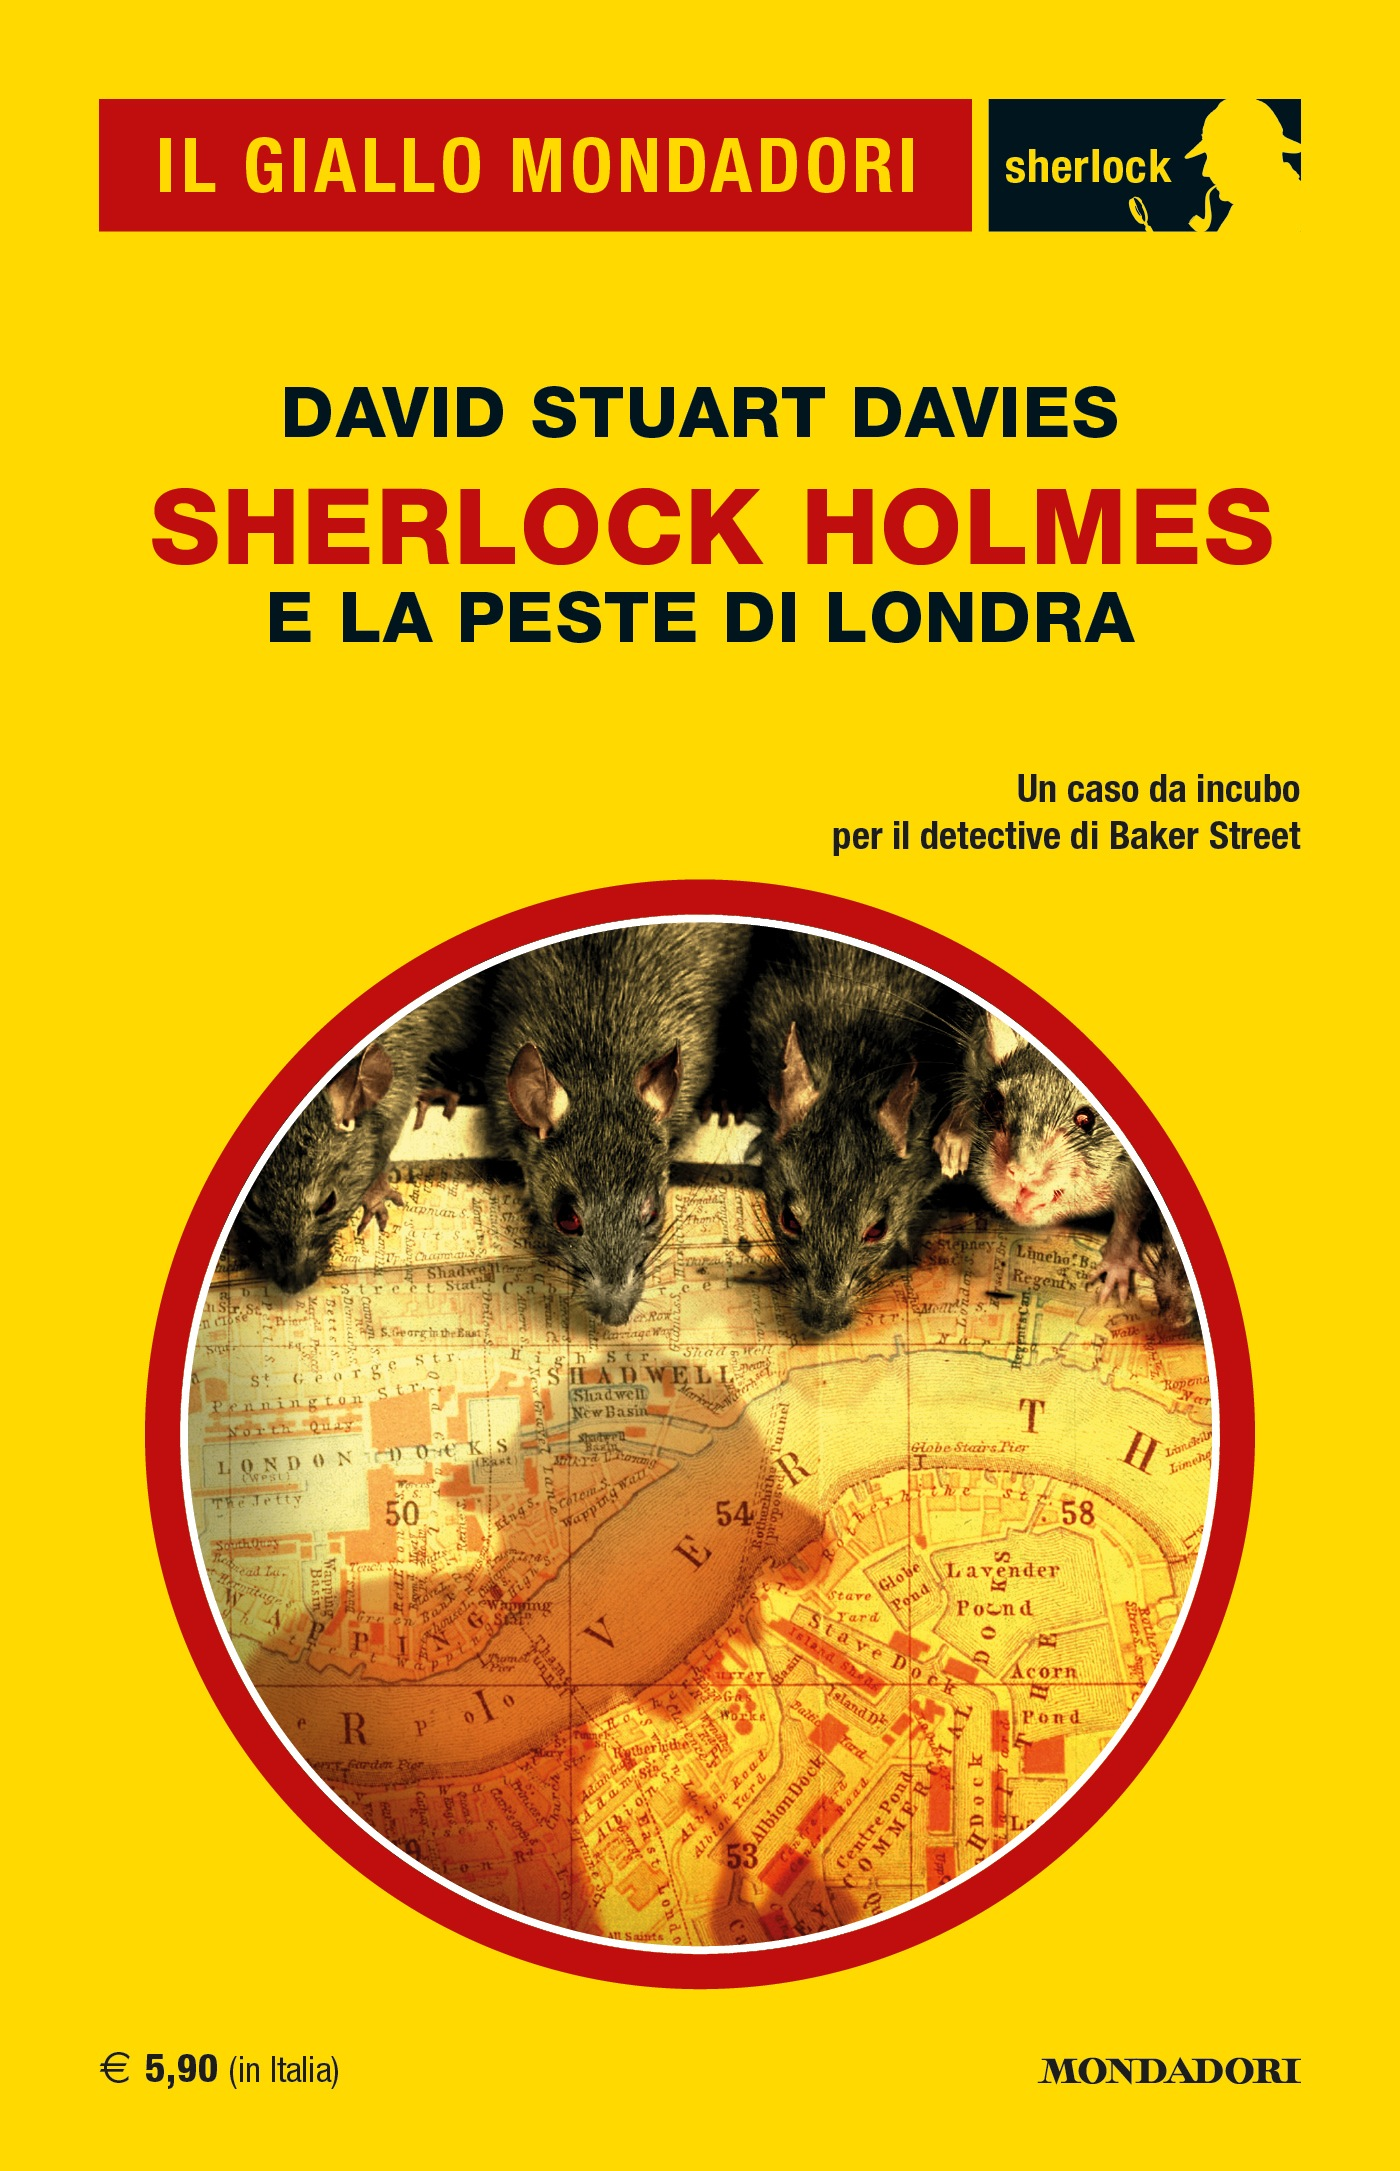 Sherlock Holmes e la peste di Londra